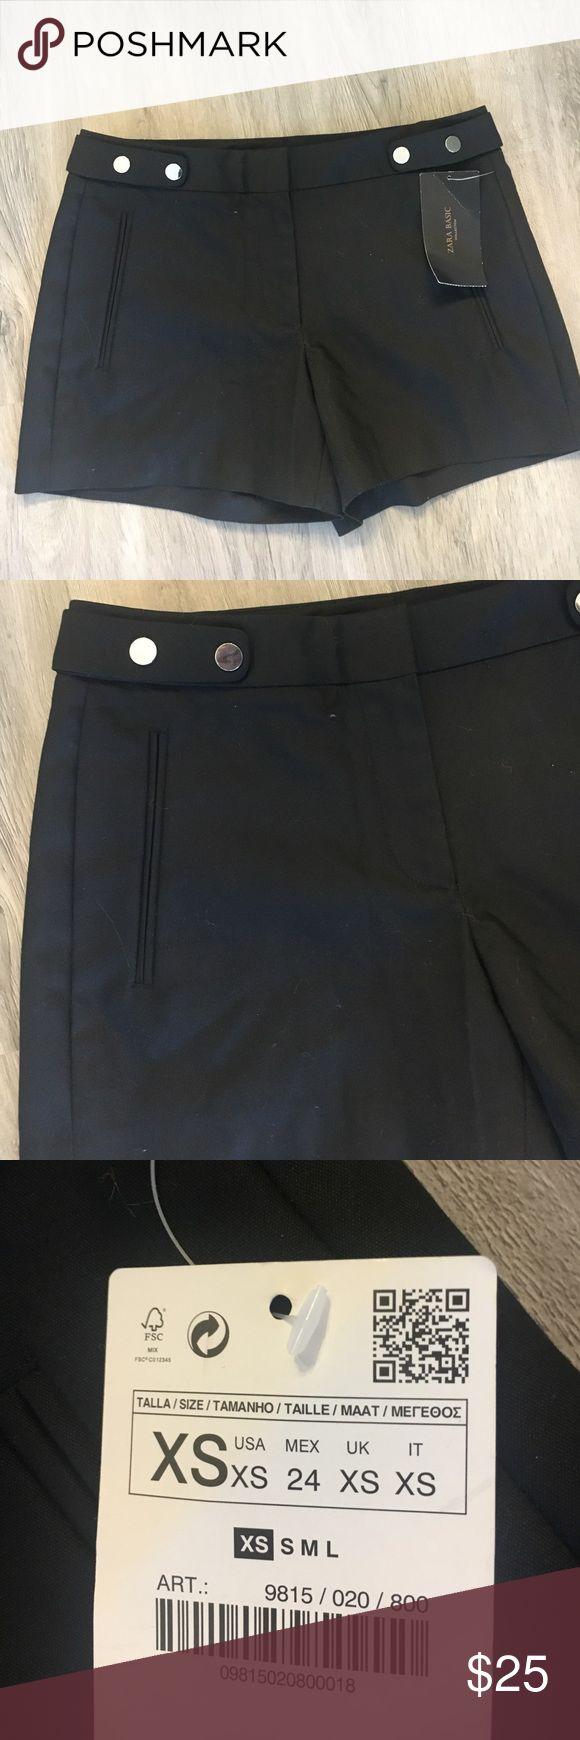 Black Zara shorts NWT XS Black Zara shorts. NEW with tags. Never worn. Size XS Zara Shorts